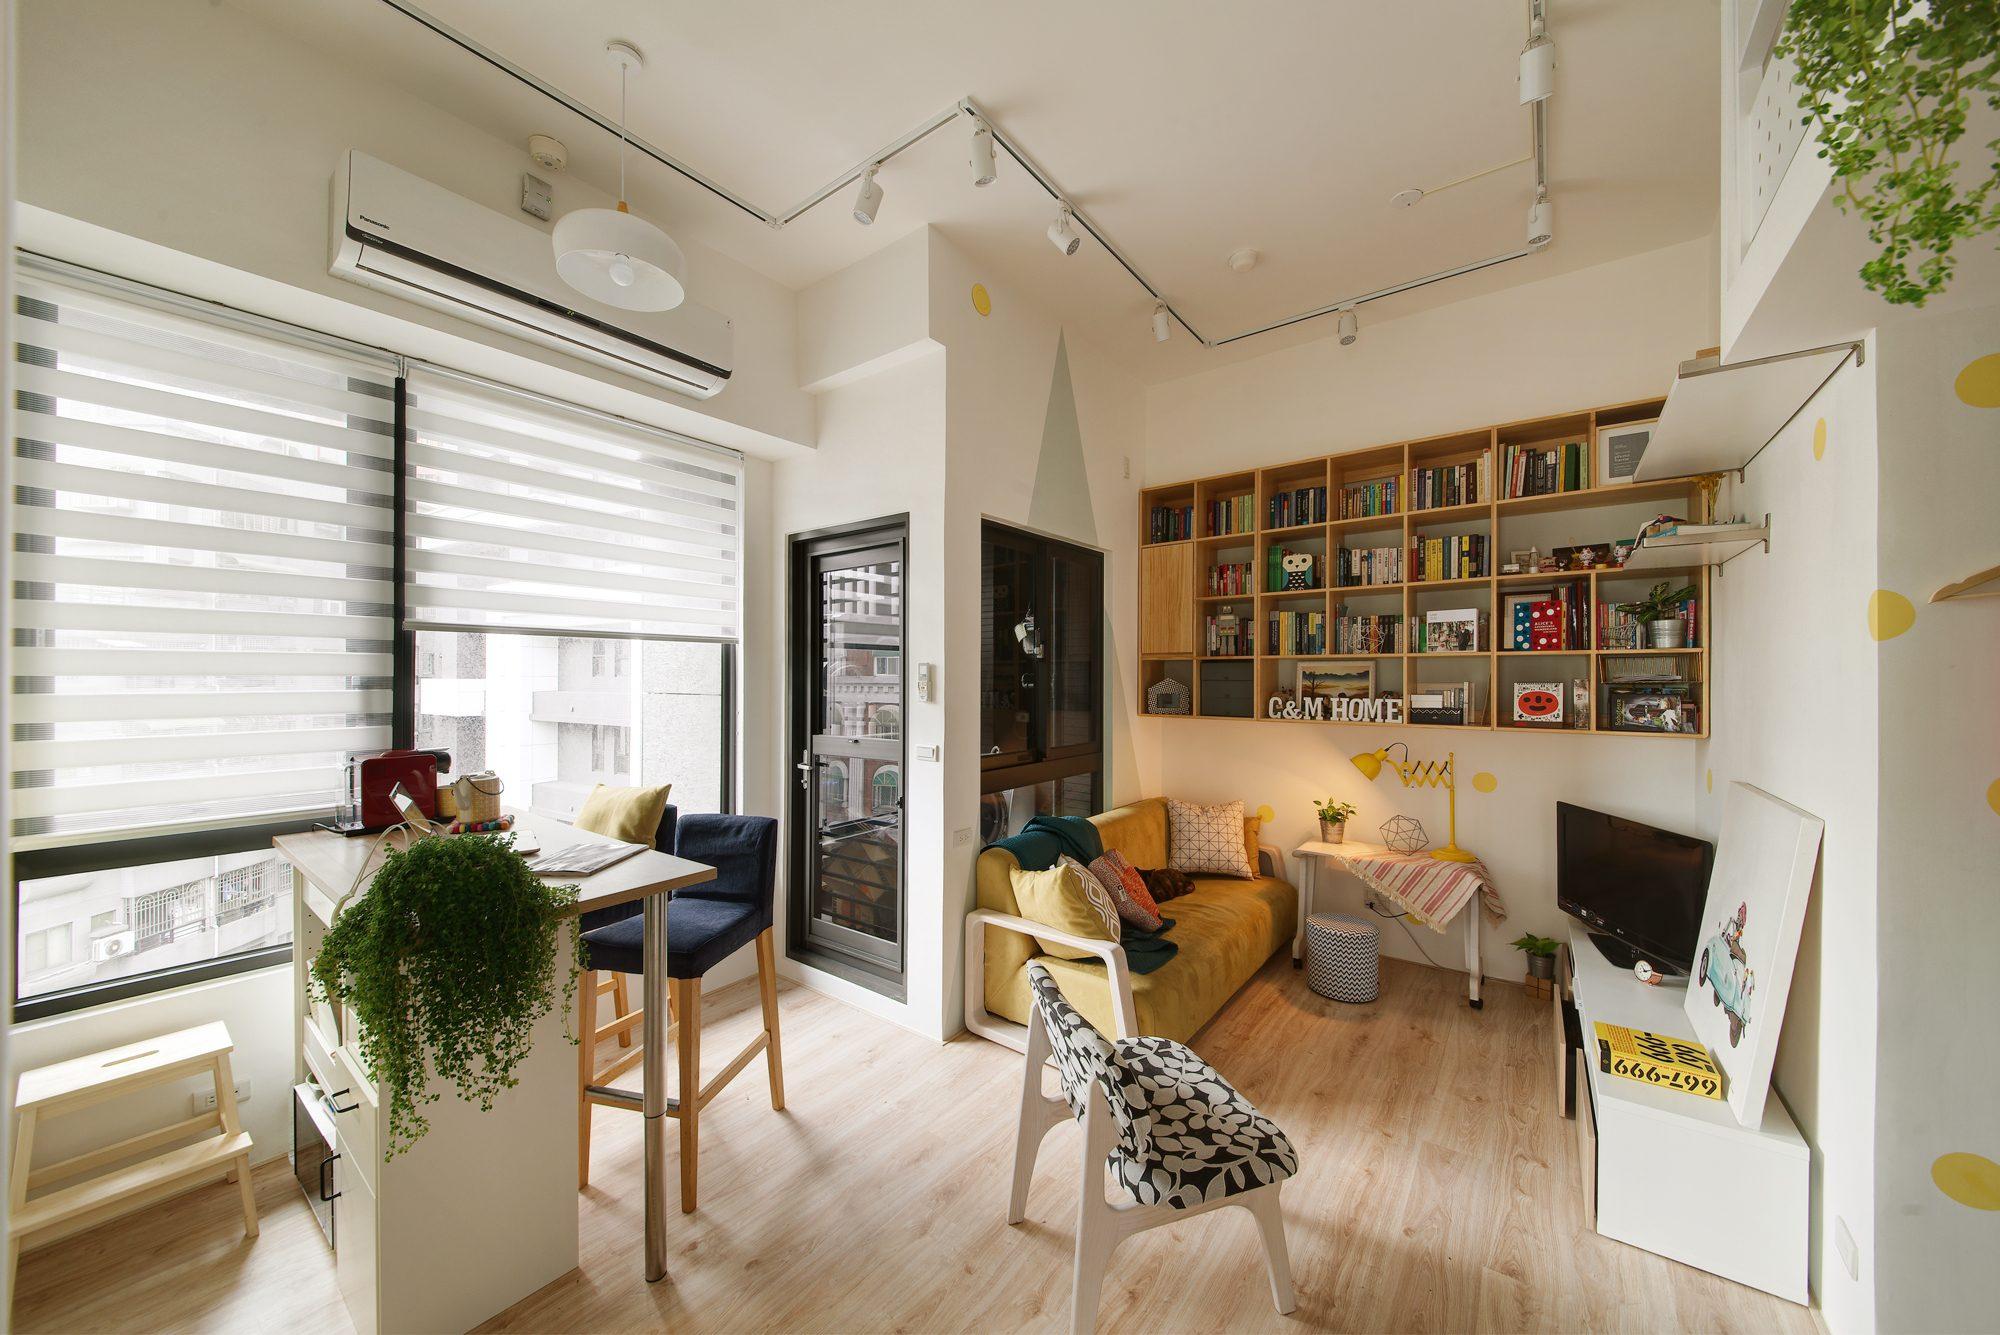 3 354 2000x1335 - Идеи для ремонта квартиры-студии